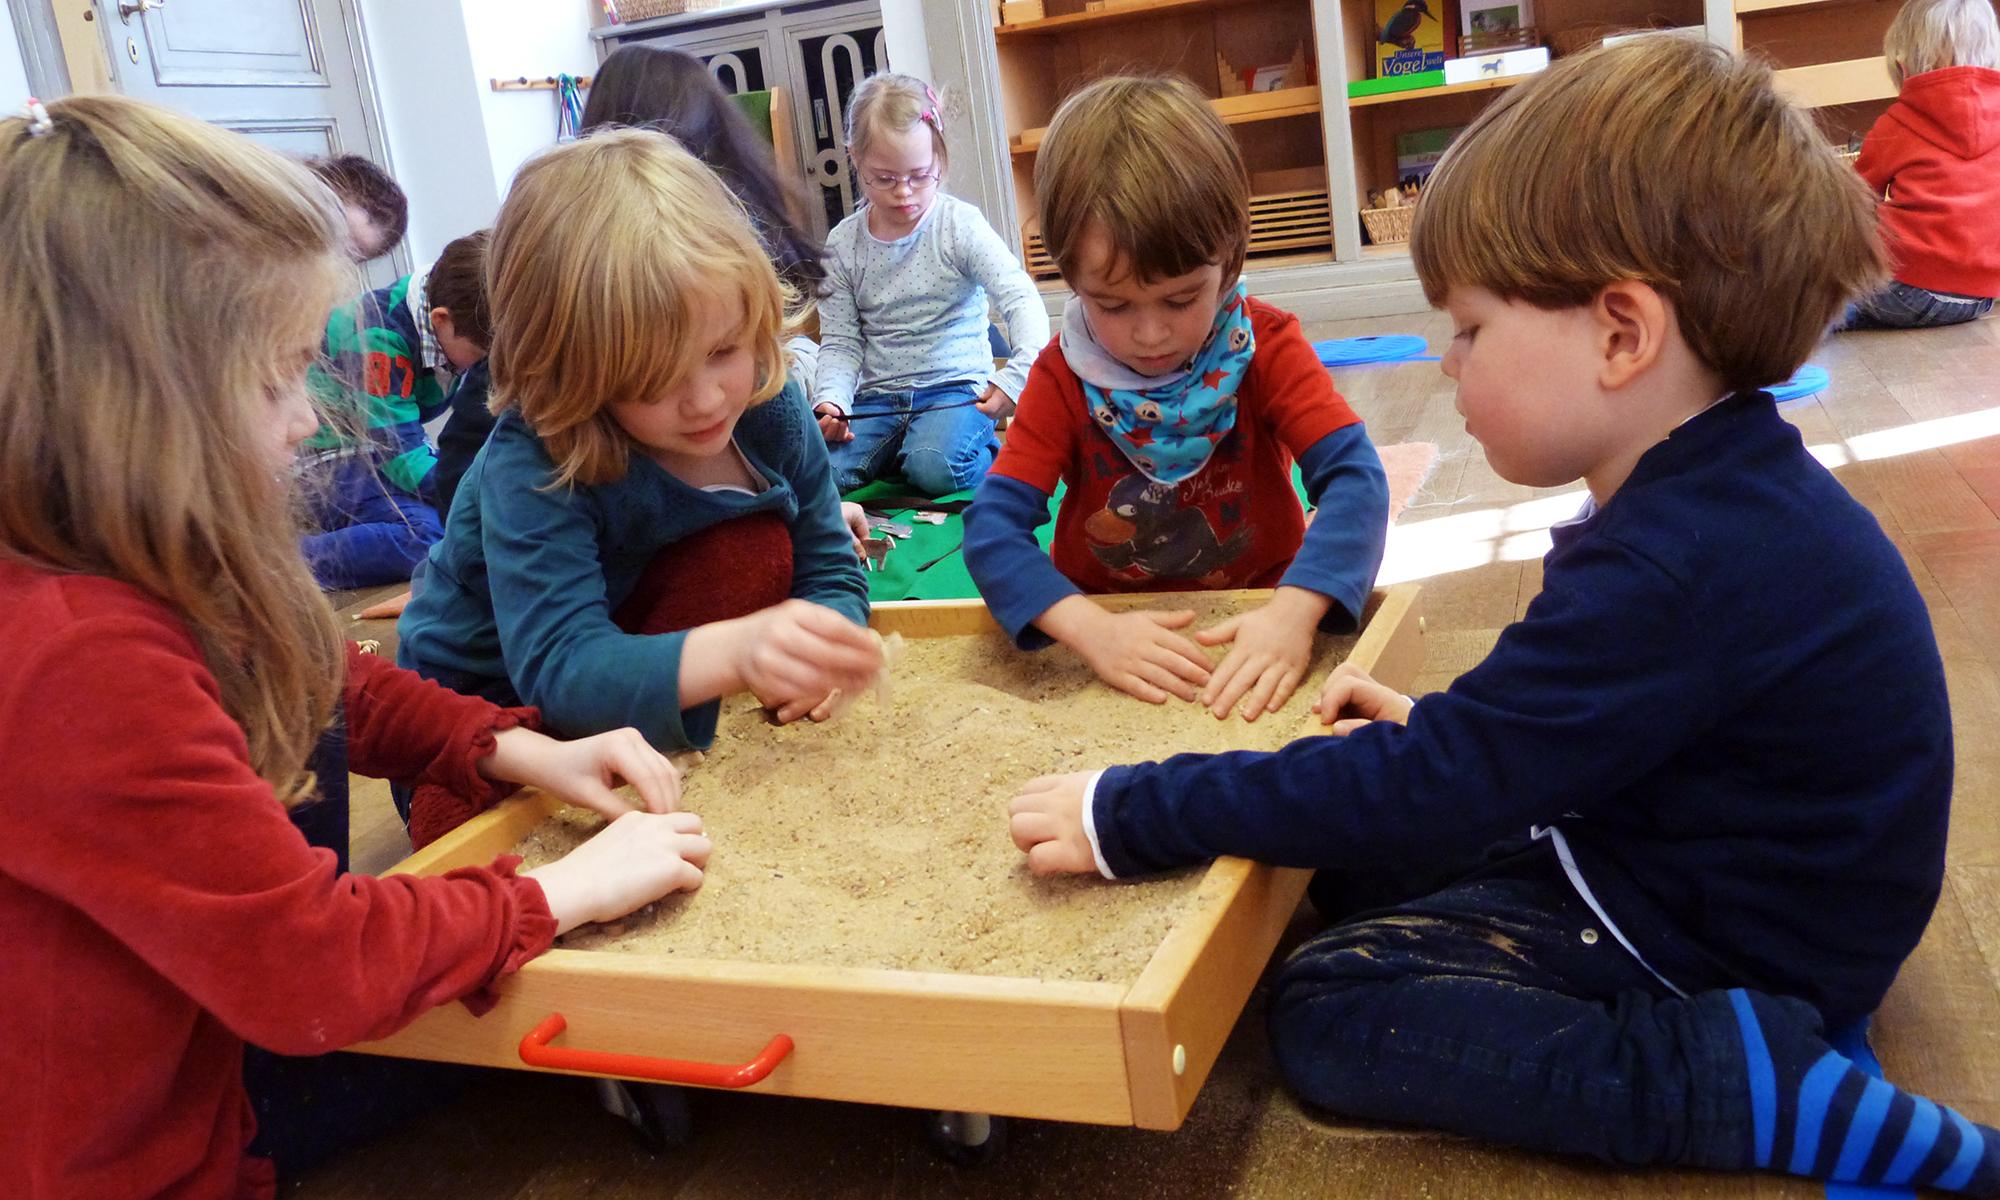 Soziales Lernen - Montessori integrativer Kindergarten, Beethovenstrasse, 79100 Freiburg